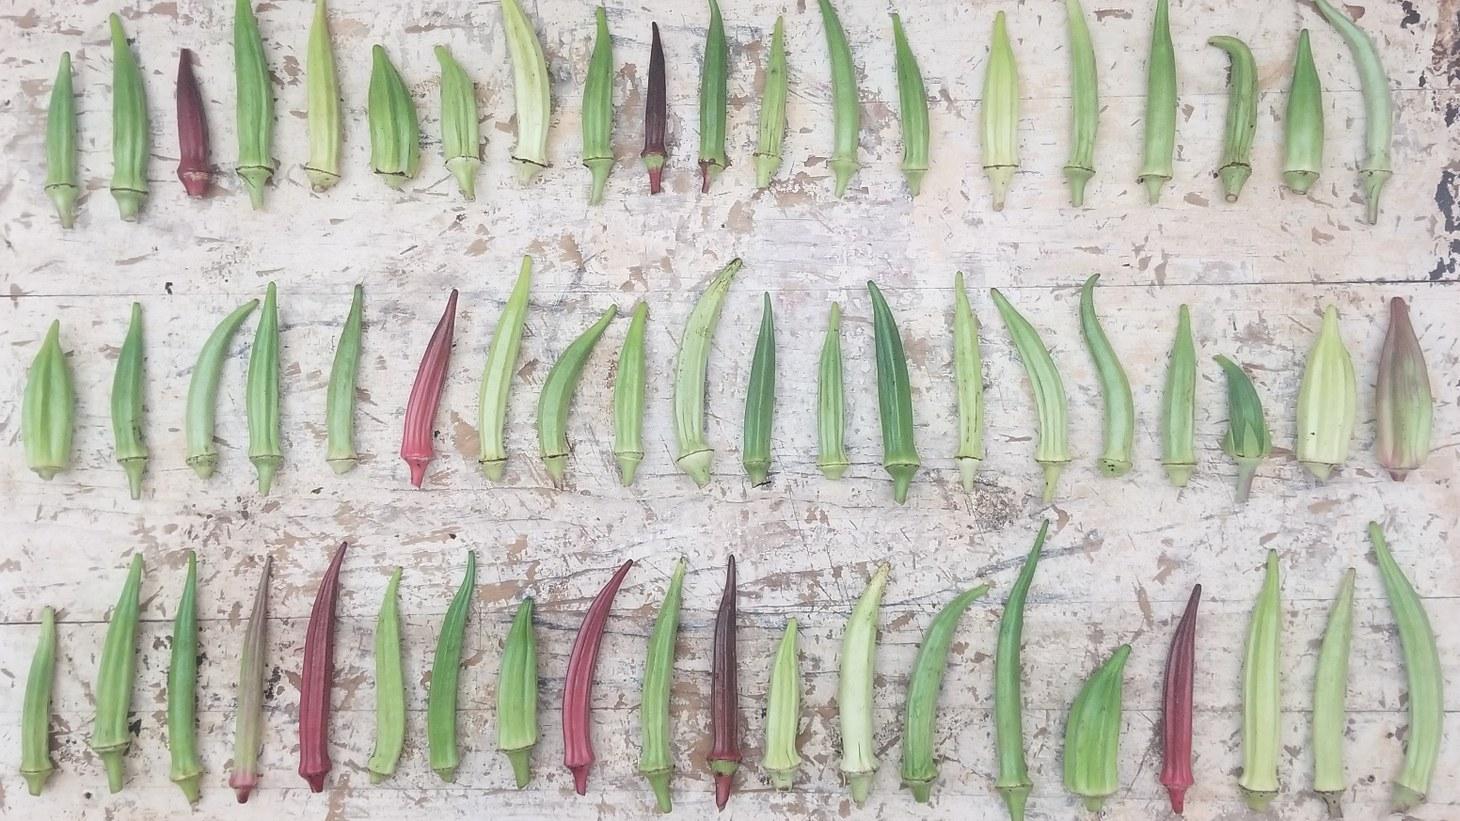 Whole okra variety.